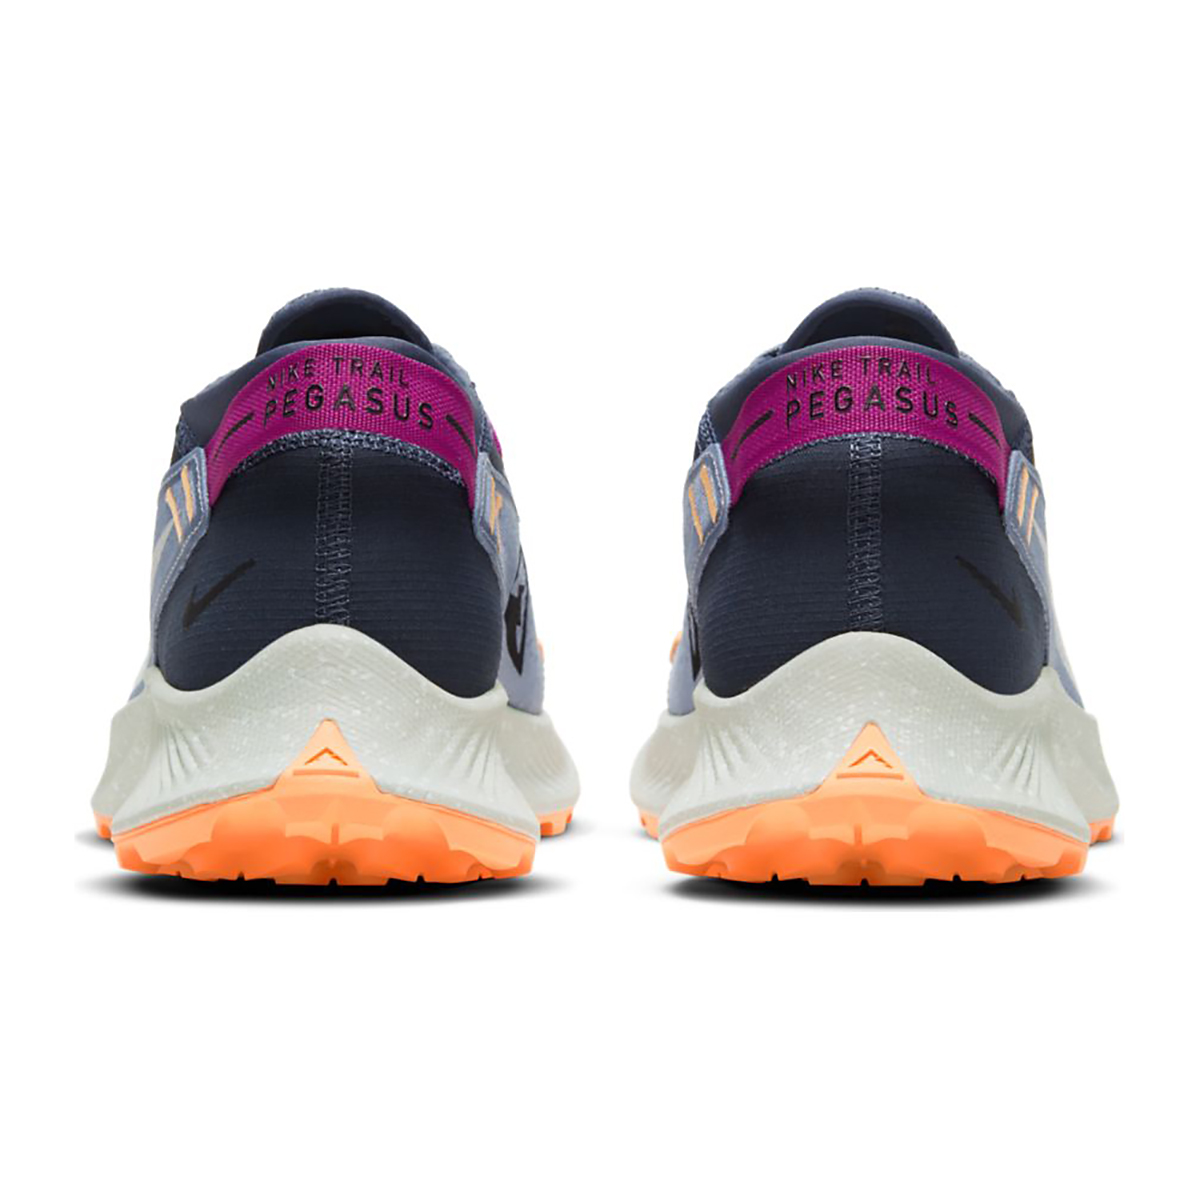 Women's Nike Pegasus Trail 2 Trail Running Shoe - Color: Thunder Blue/Photon Dust/Ashen Slate - Size: 5 - Width: Regular, Thunder Blue/Photon Dust/Ashen Slate, large, image 4